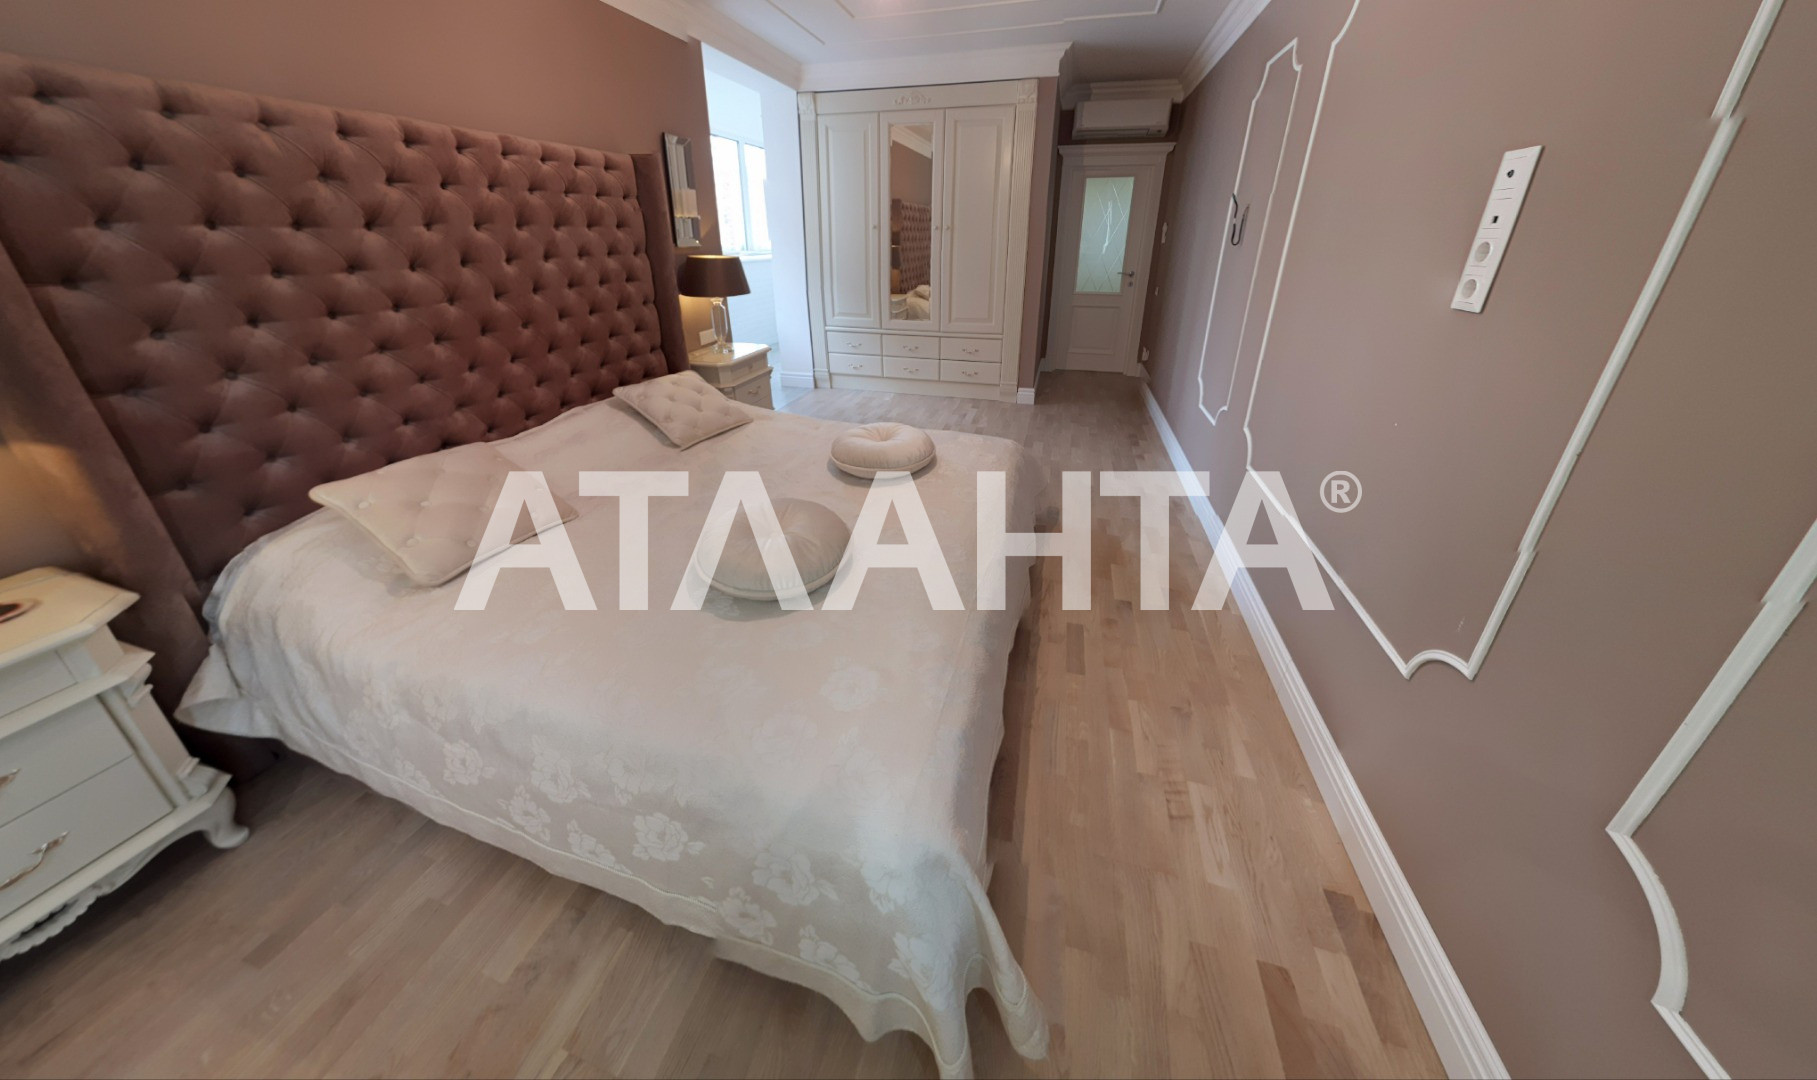 Продается 3-комнатная Квартира на ул. Ул. Ломоносова — 230 000 у.е. (фото №18)